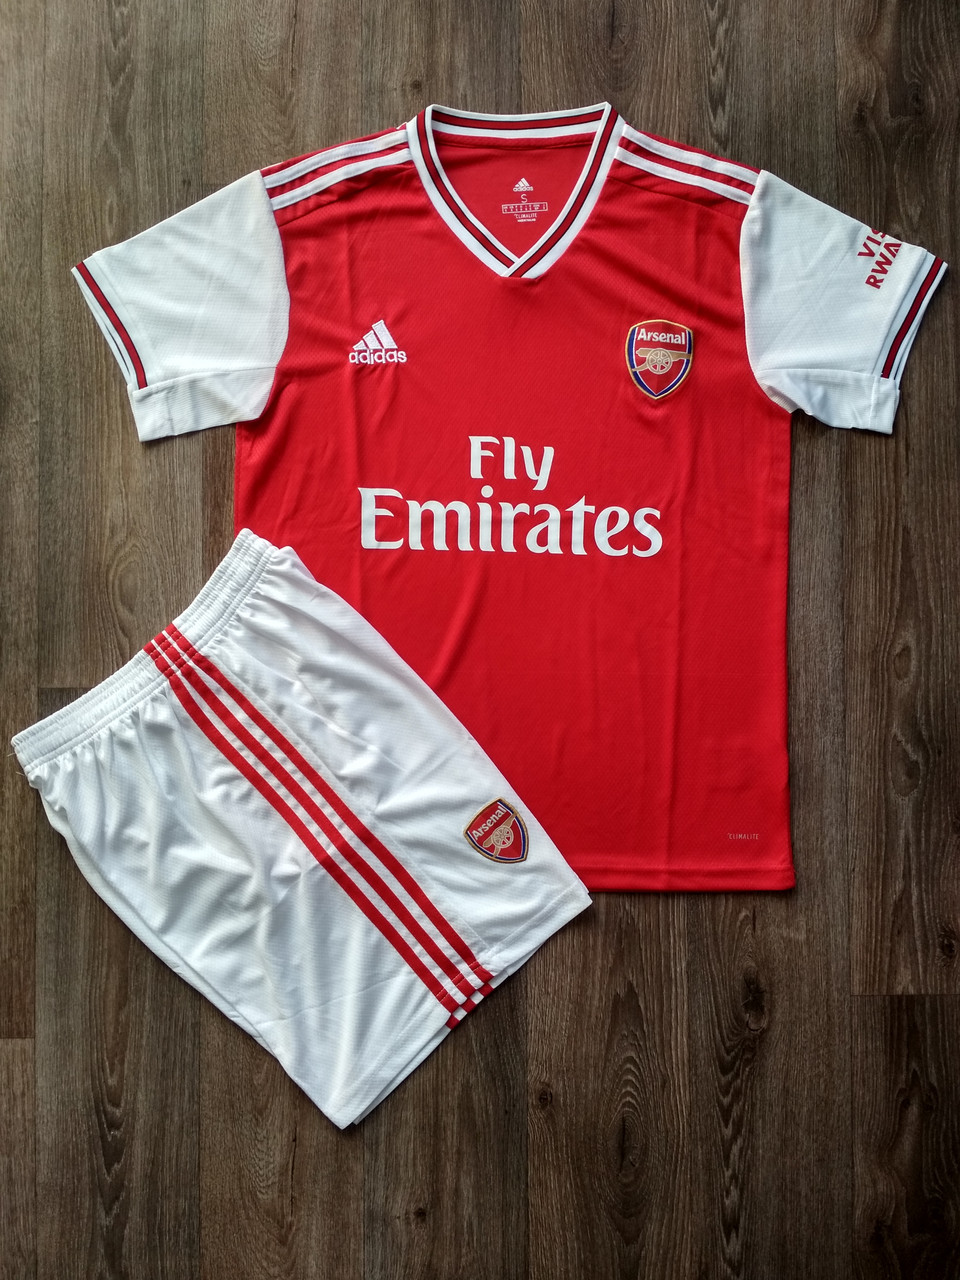 Футбольная форма Арсенал/Arsenal ( Англия, Премьер Лига ), домашняя, сезон 2019-2020